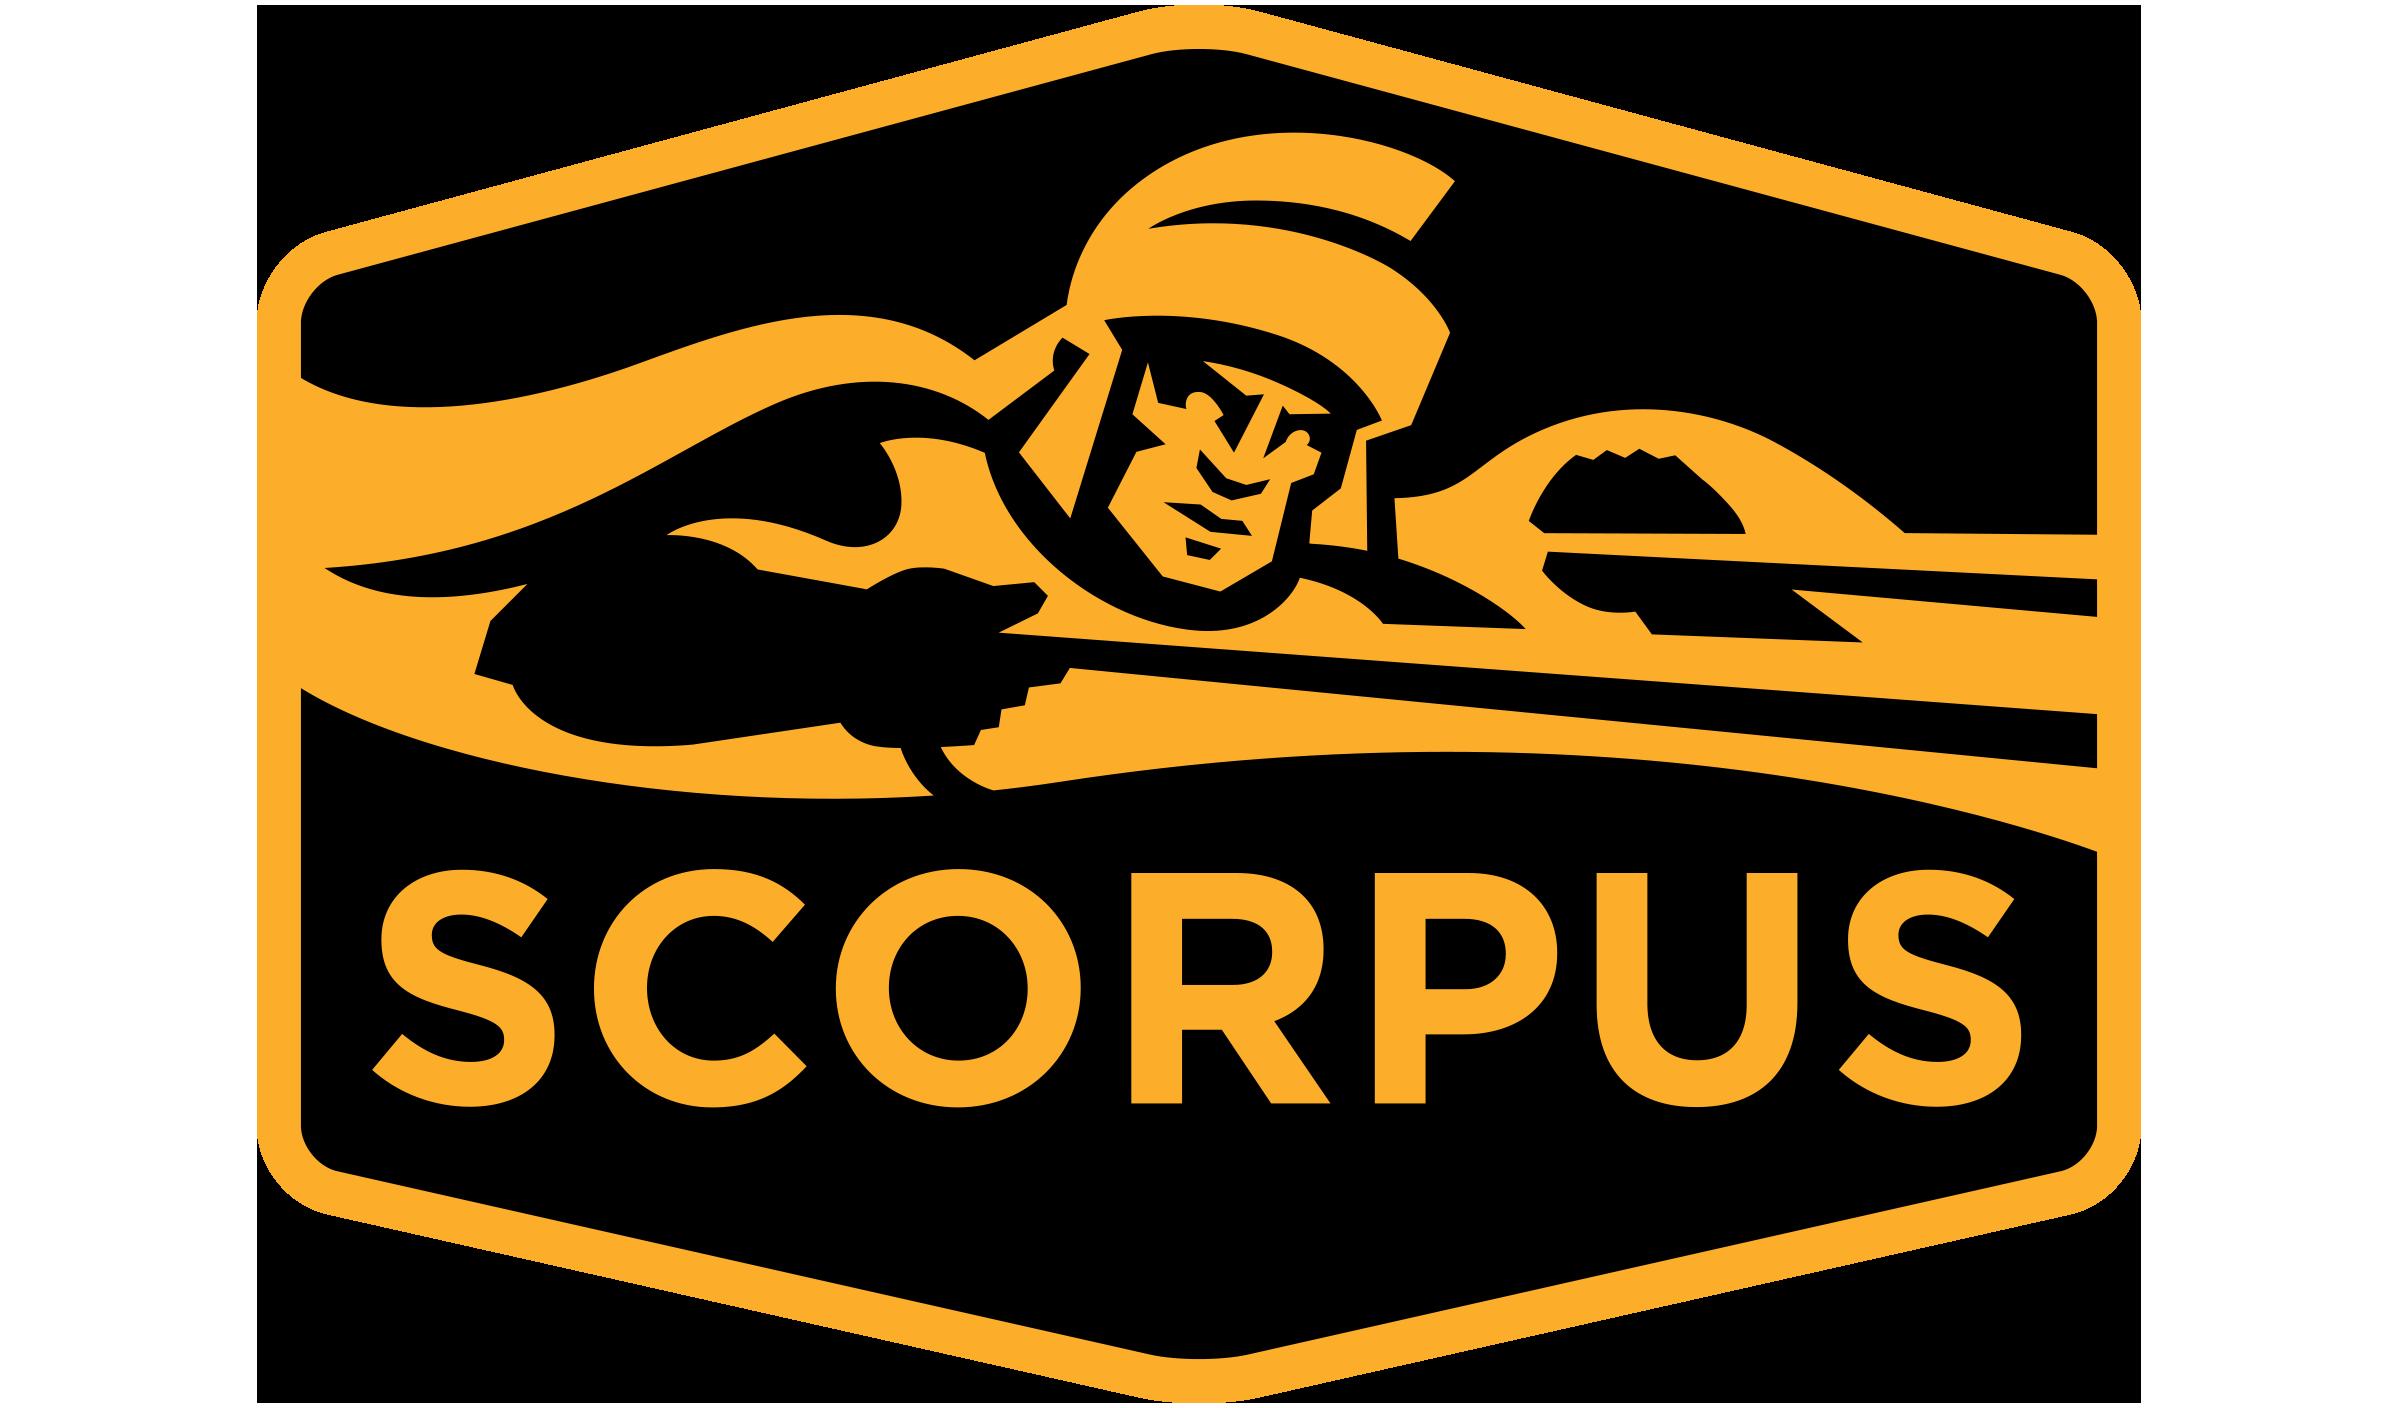 Scorpus and MILE Social